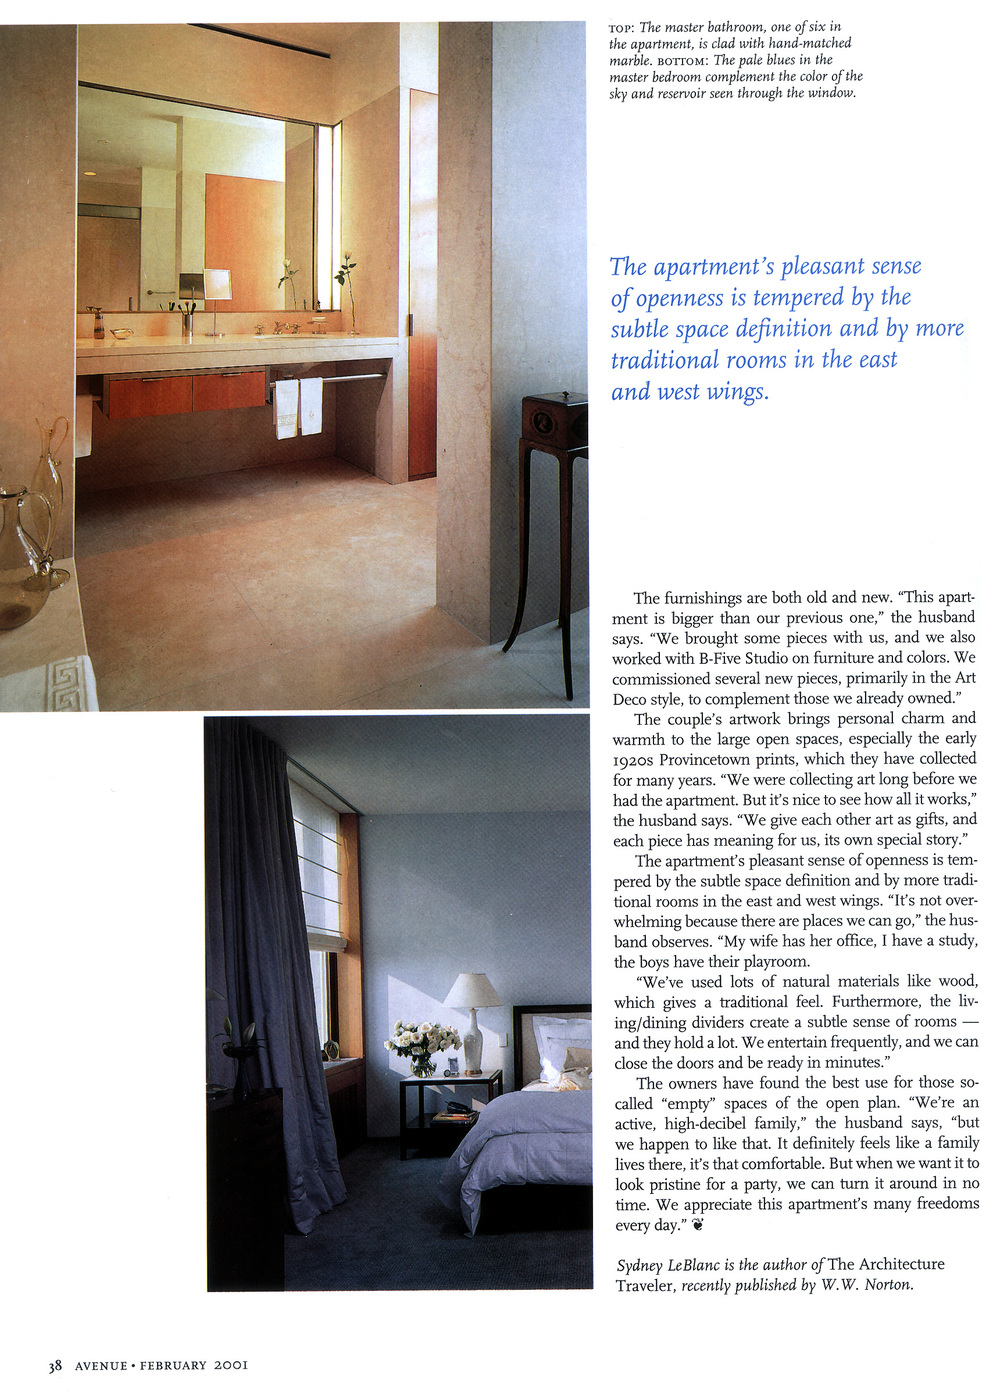 Avenue page 5a.jpg